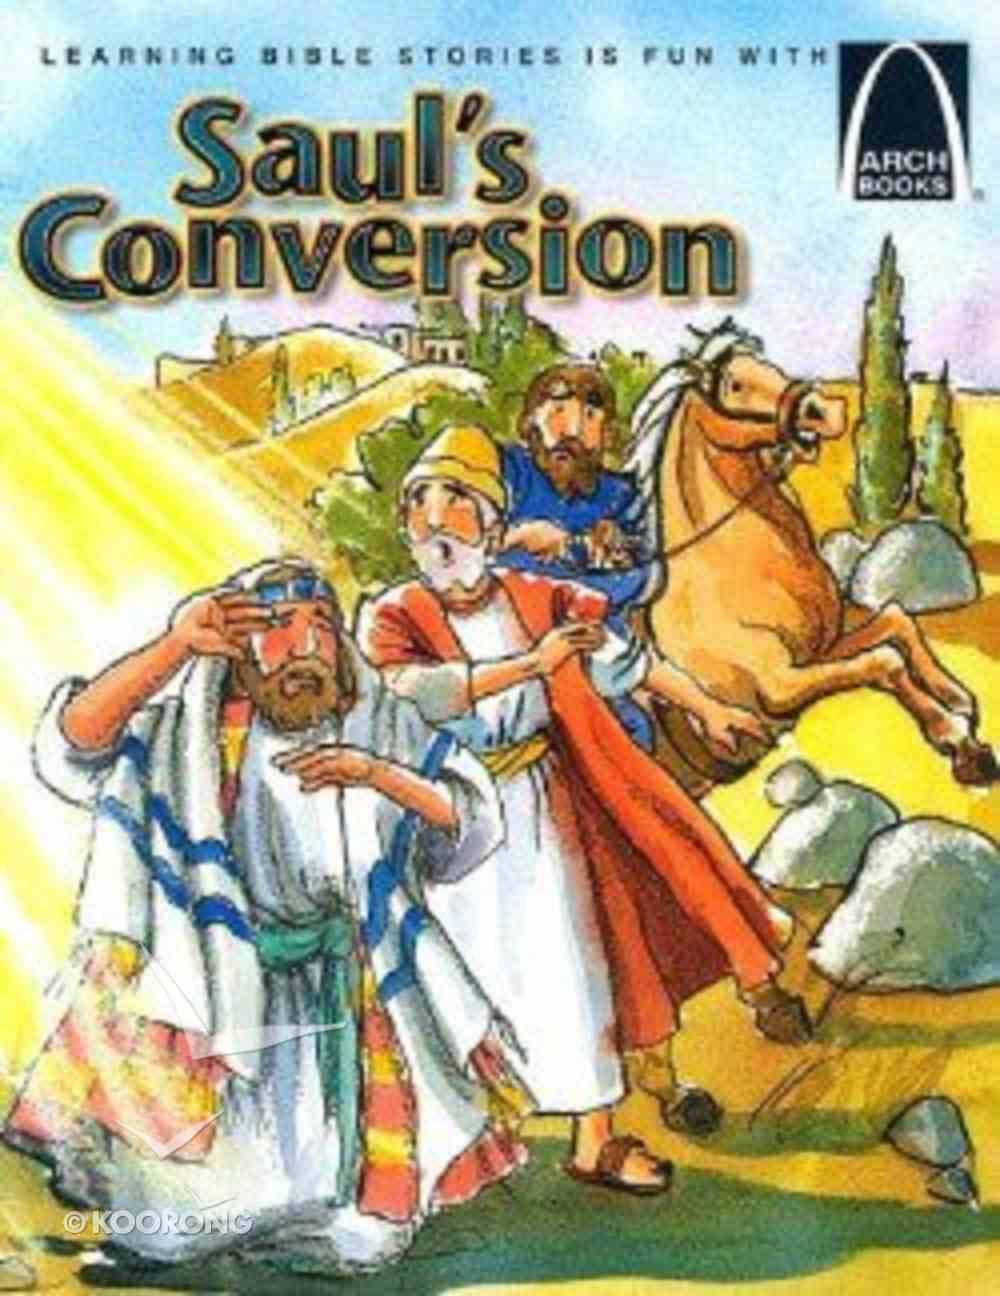 Saul's Conversion (Arch Books Series) Paperback